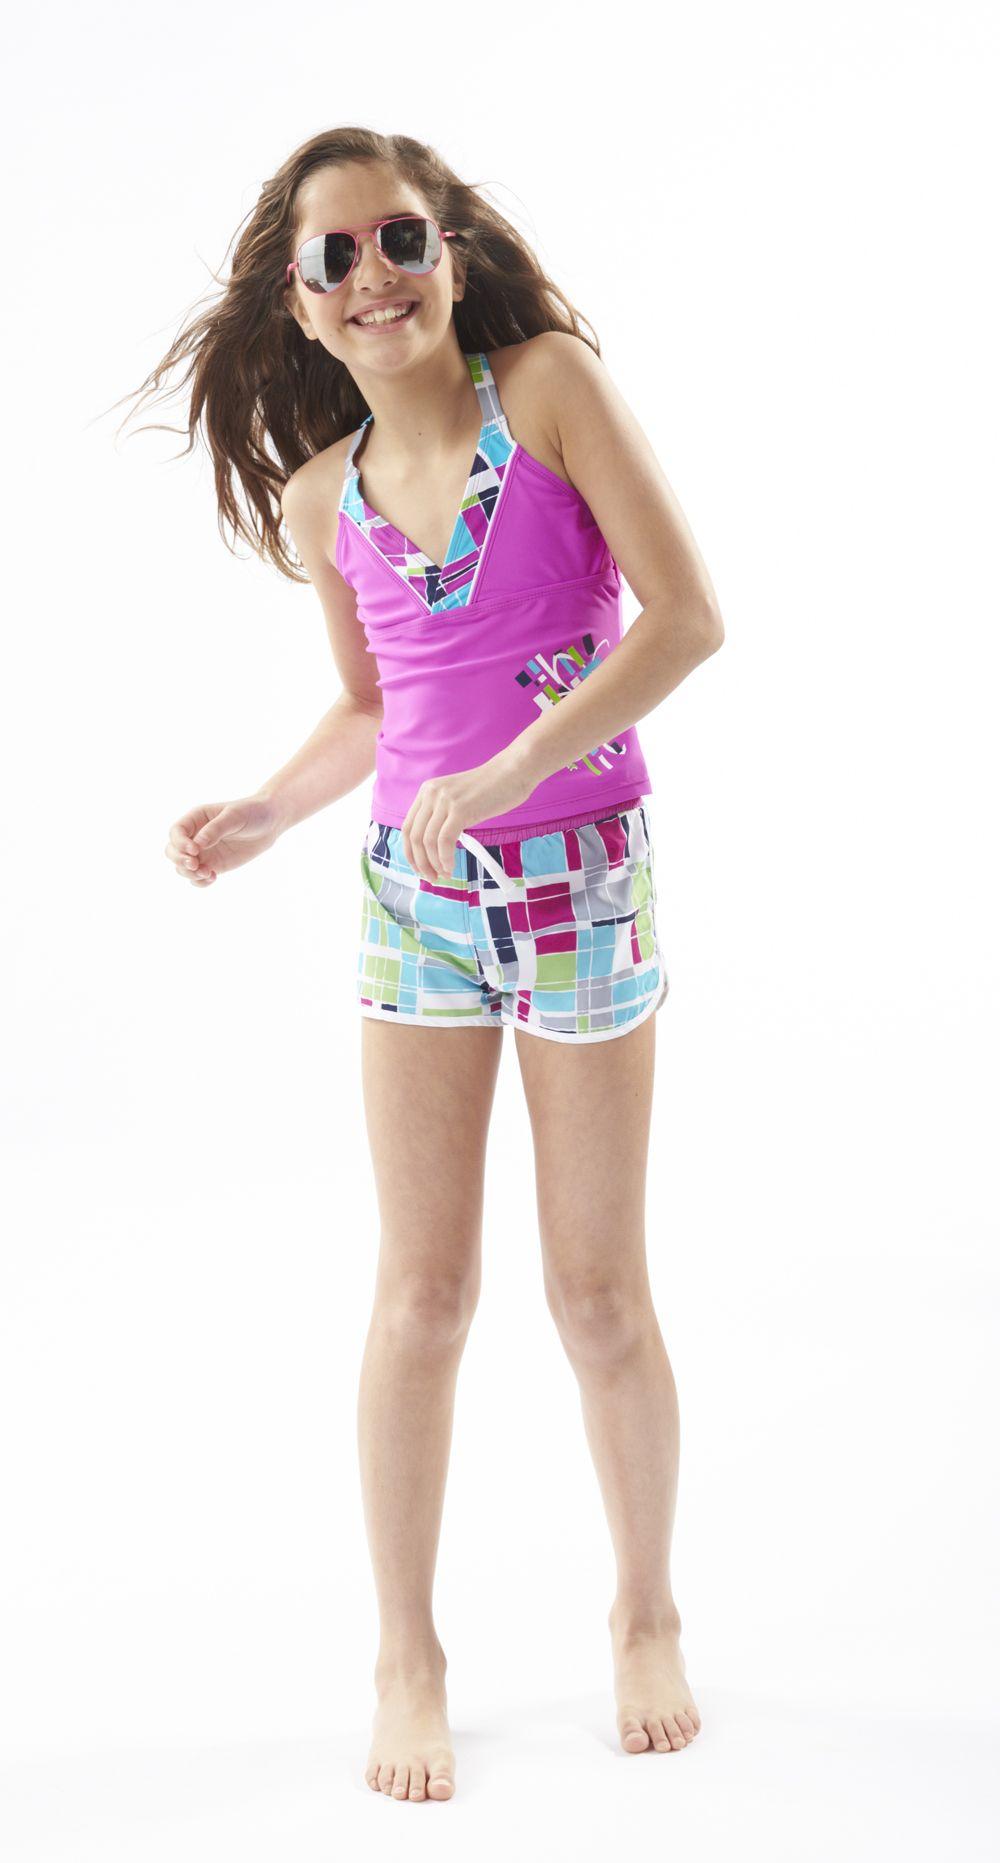 decc41901a8b5 Surfer cool! #girls #swim #Kohls | cute thangs | Girls swimming ...